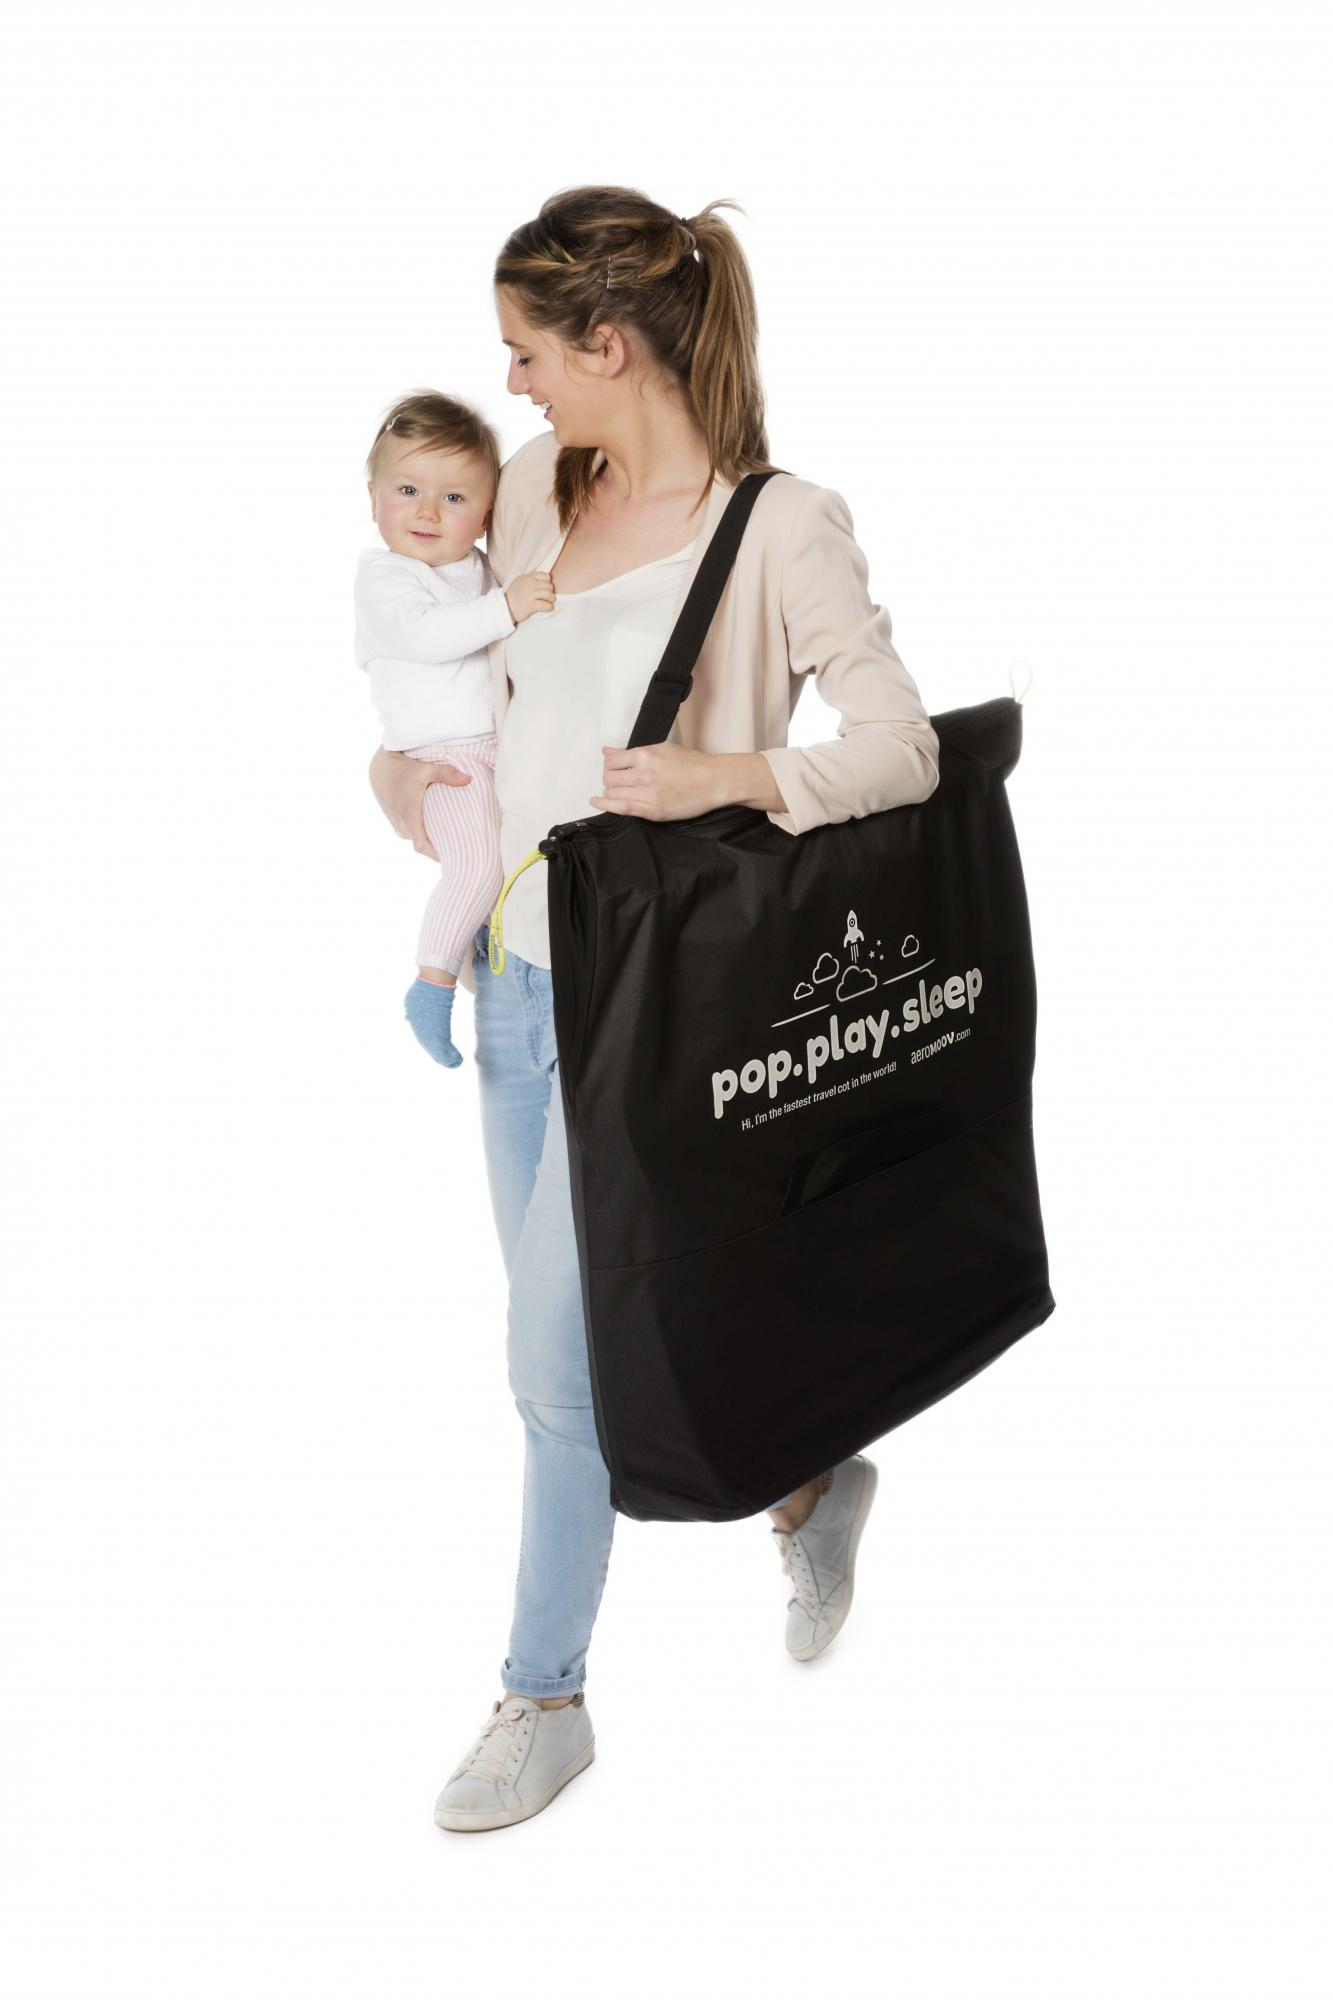 l_aeromoov-atc-packaging-mother-child-1476191653